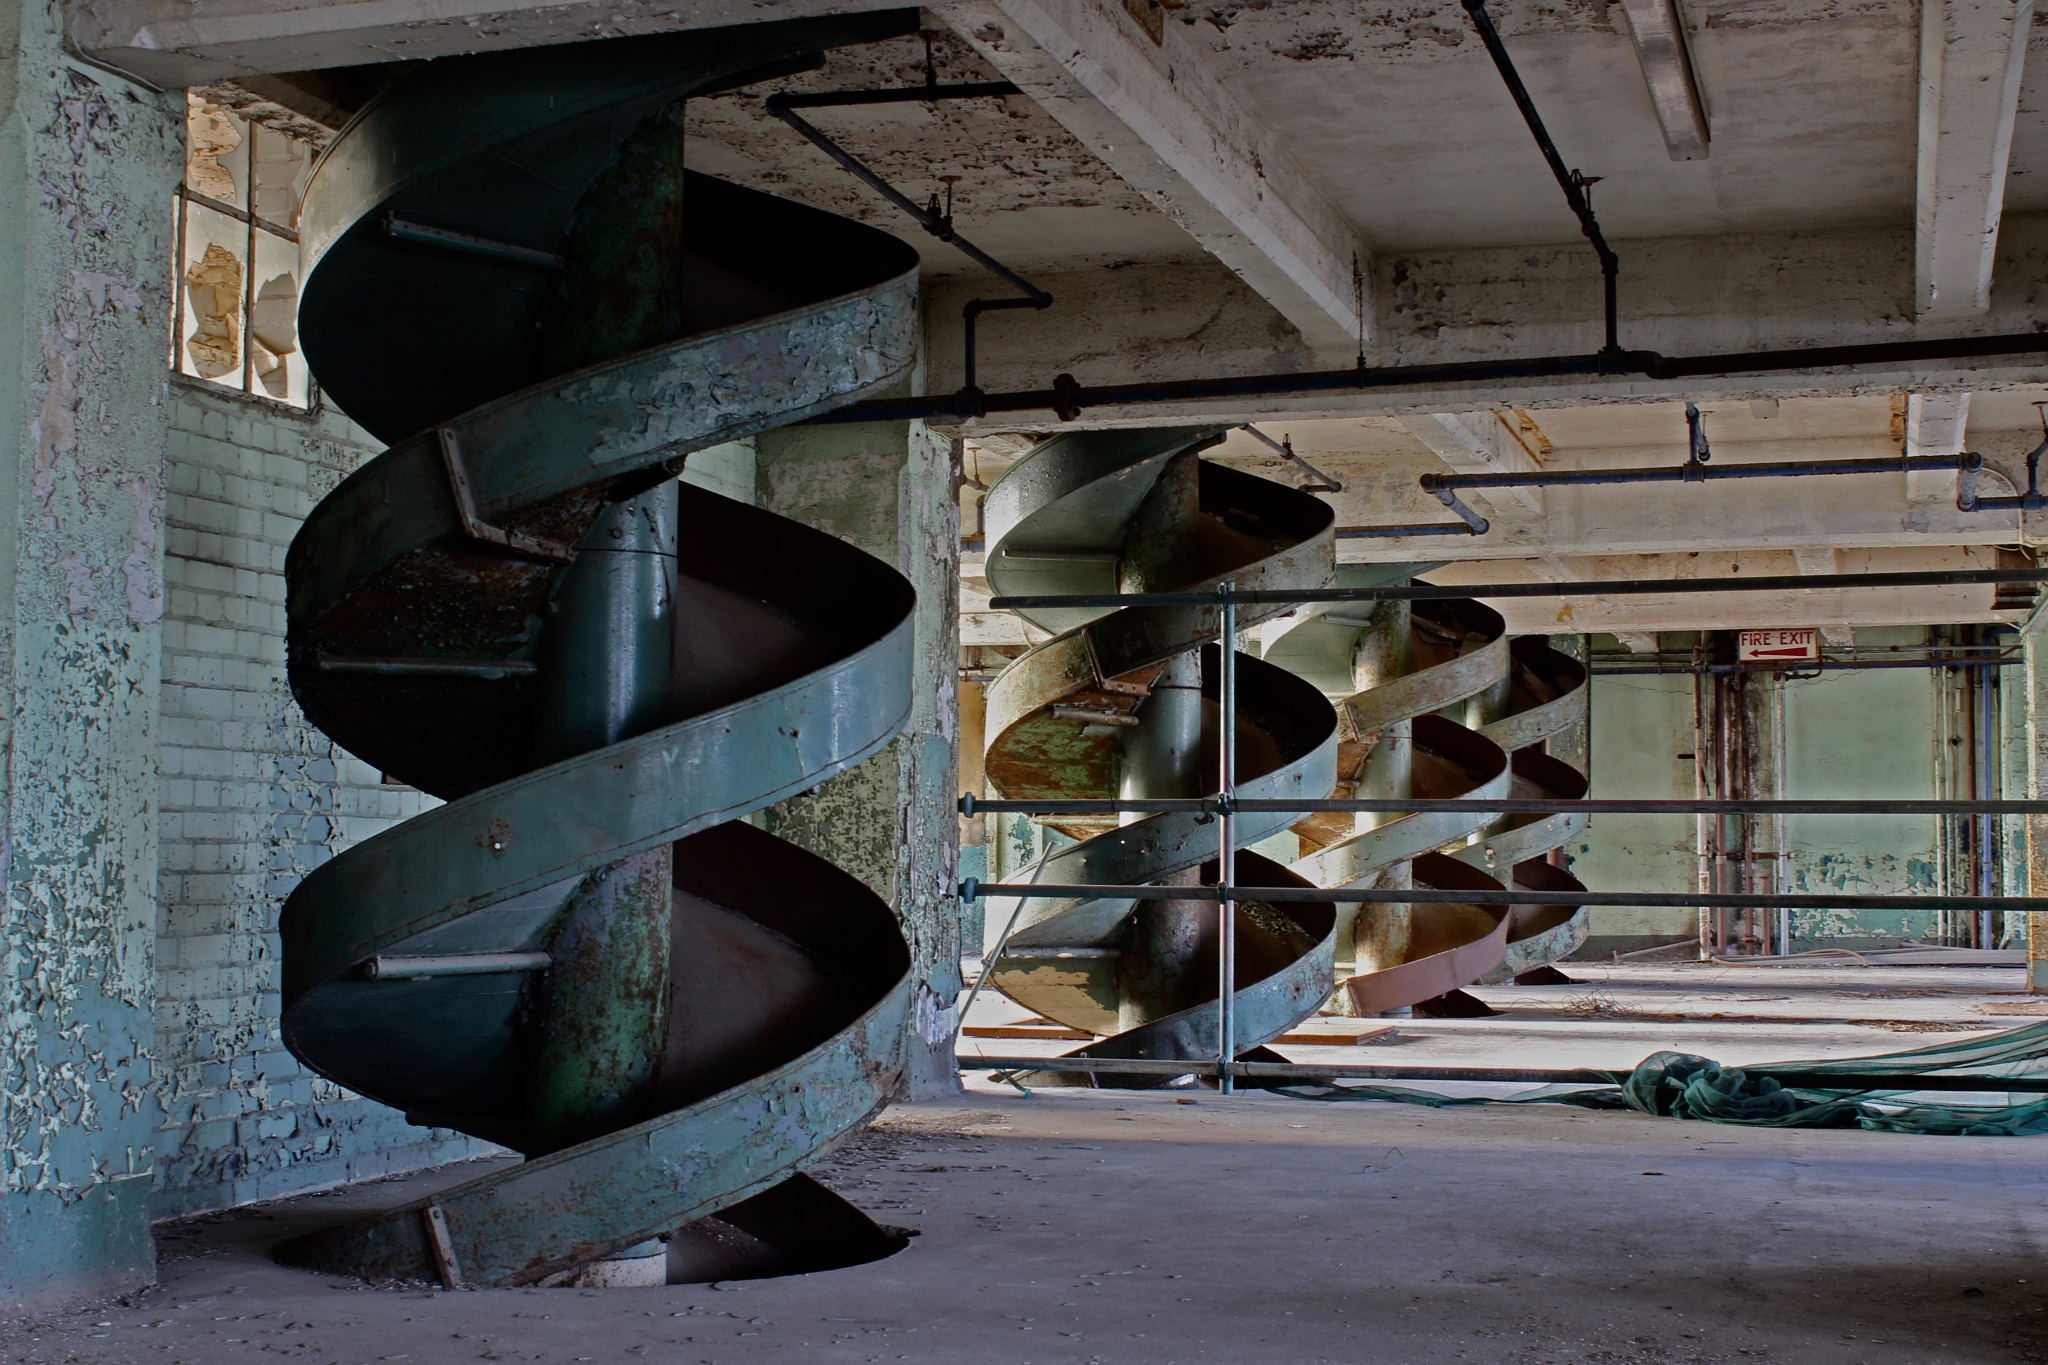 Helter Skelter by Richie Gowen